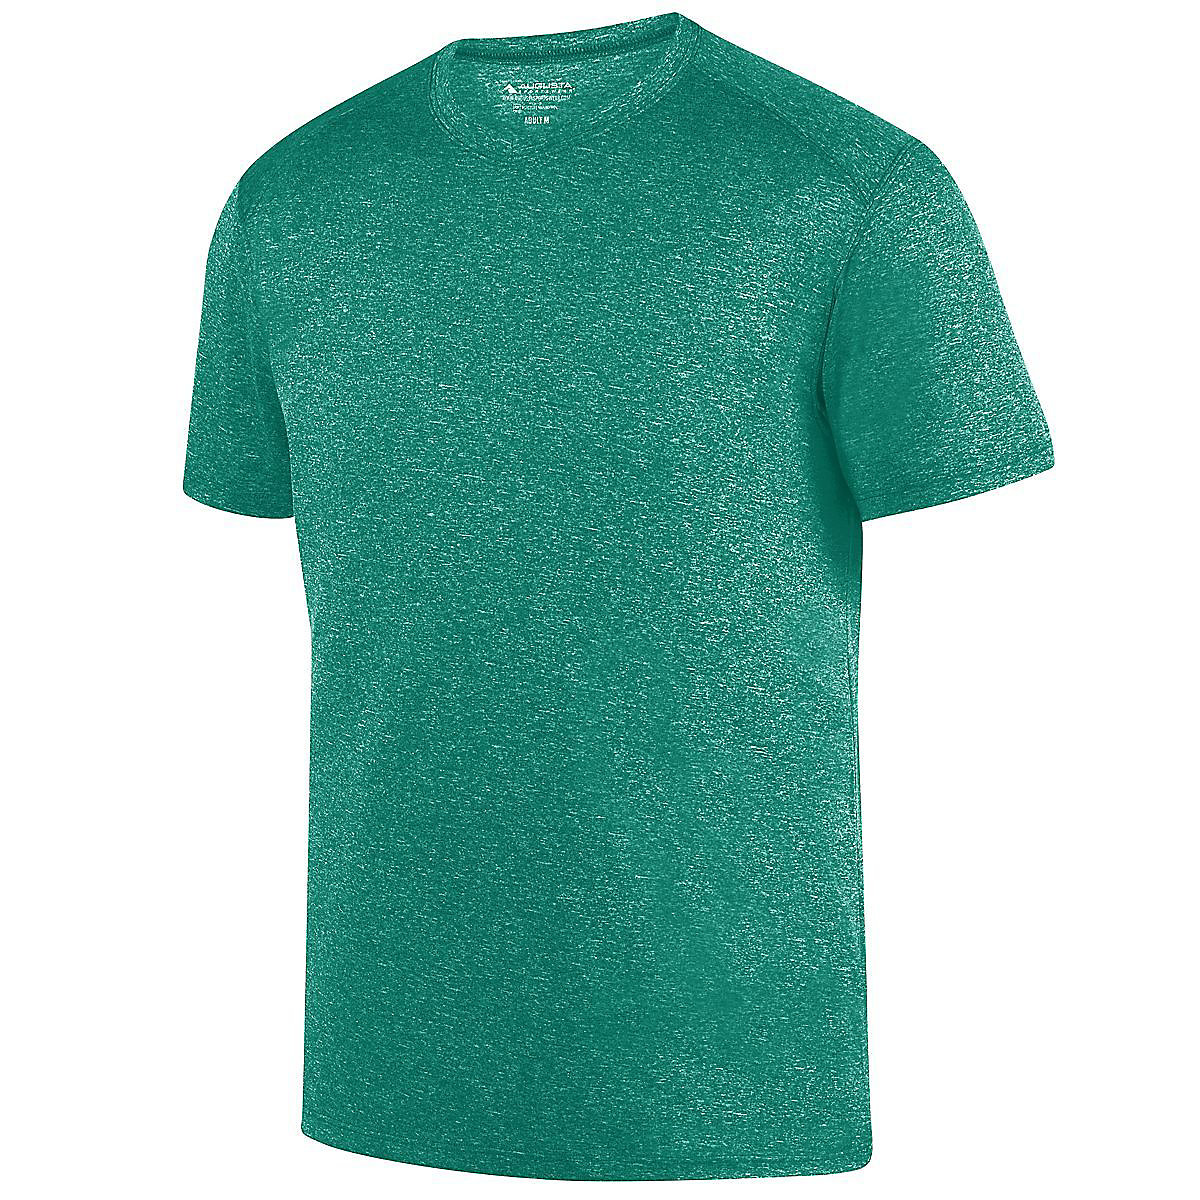 2800 Kinergy Training T Shirt By Augusta Sportswear Colorsize